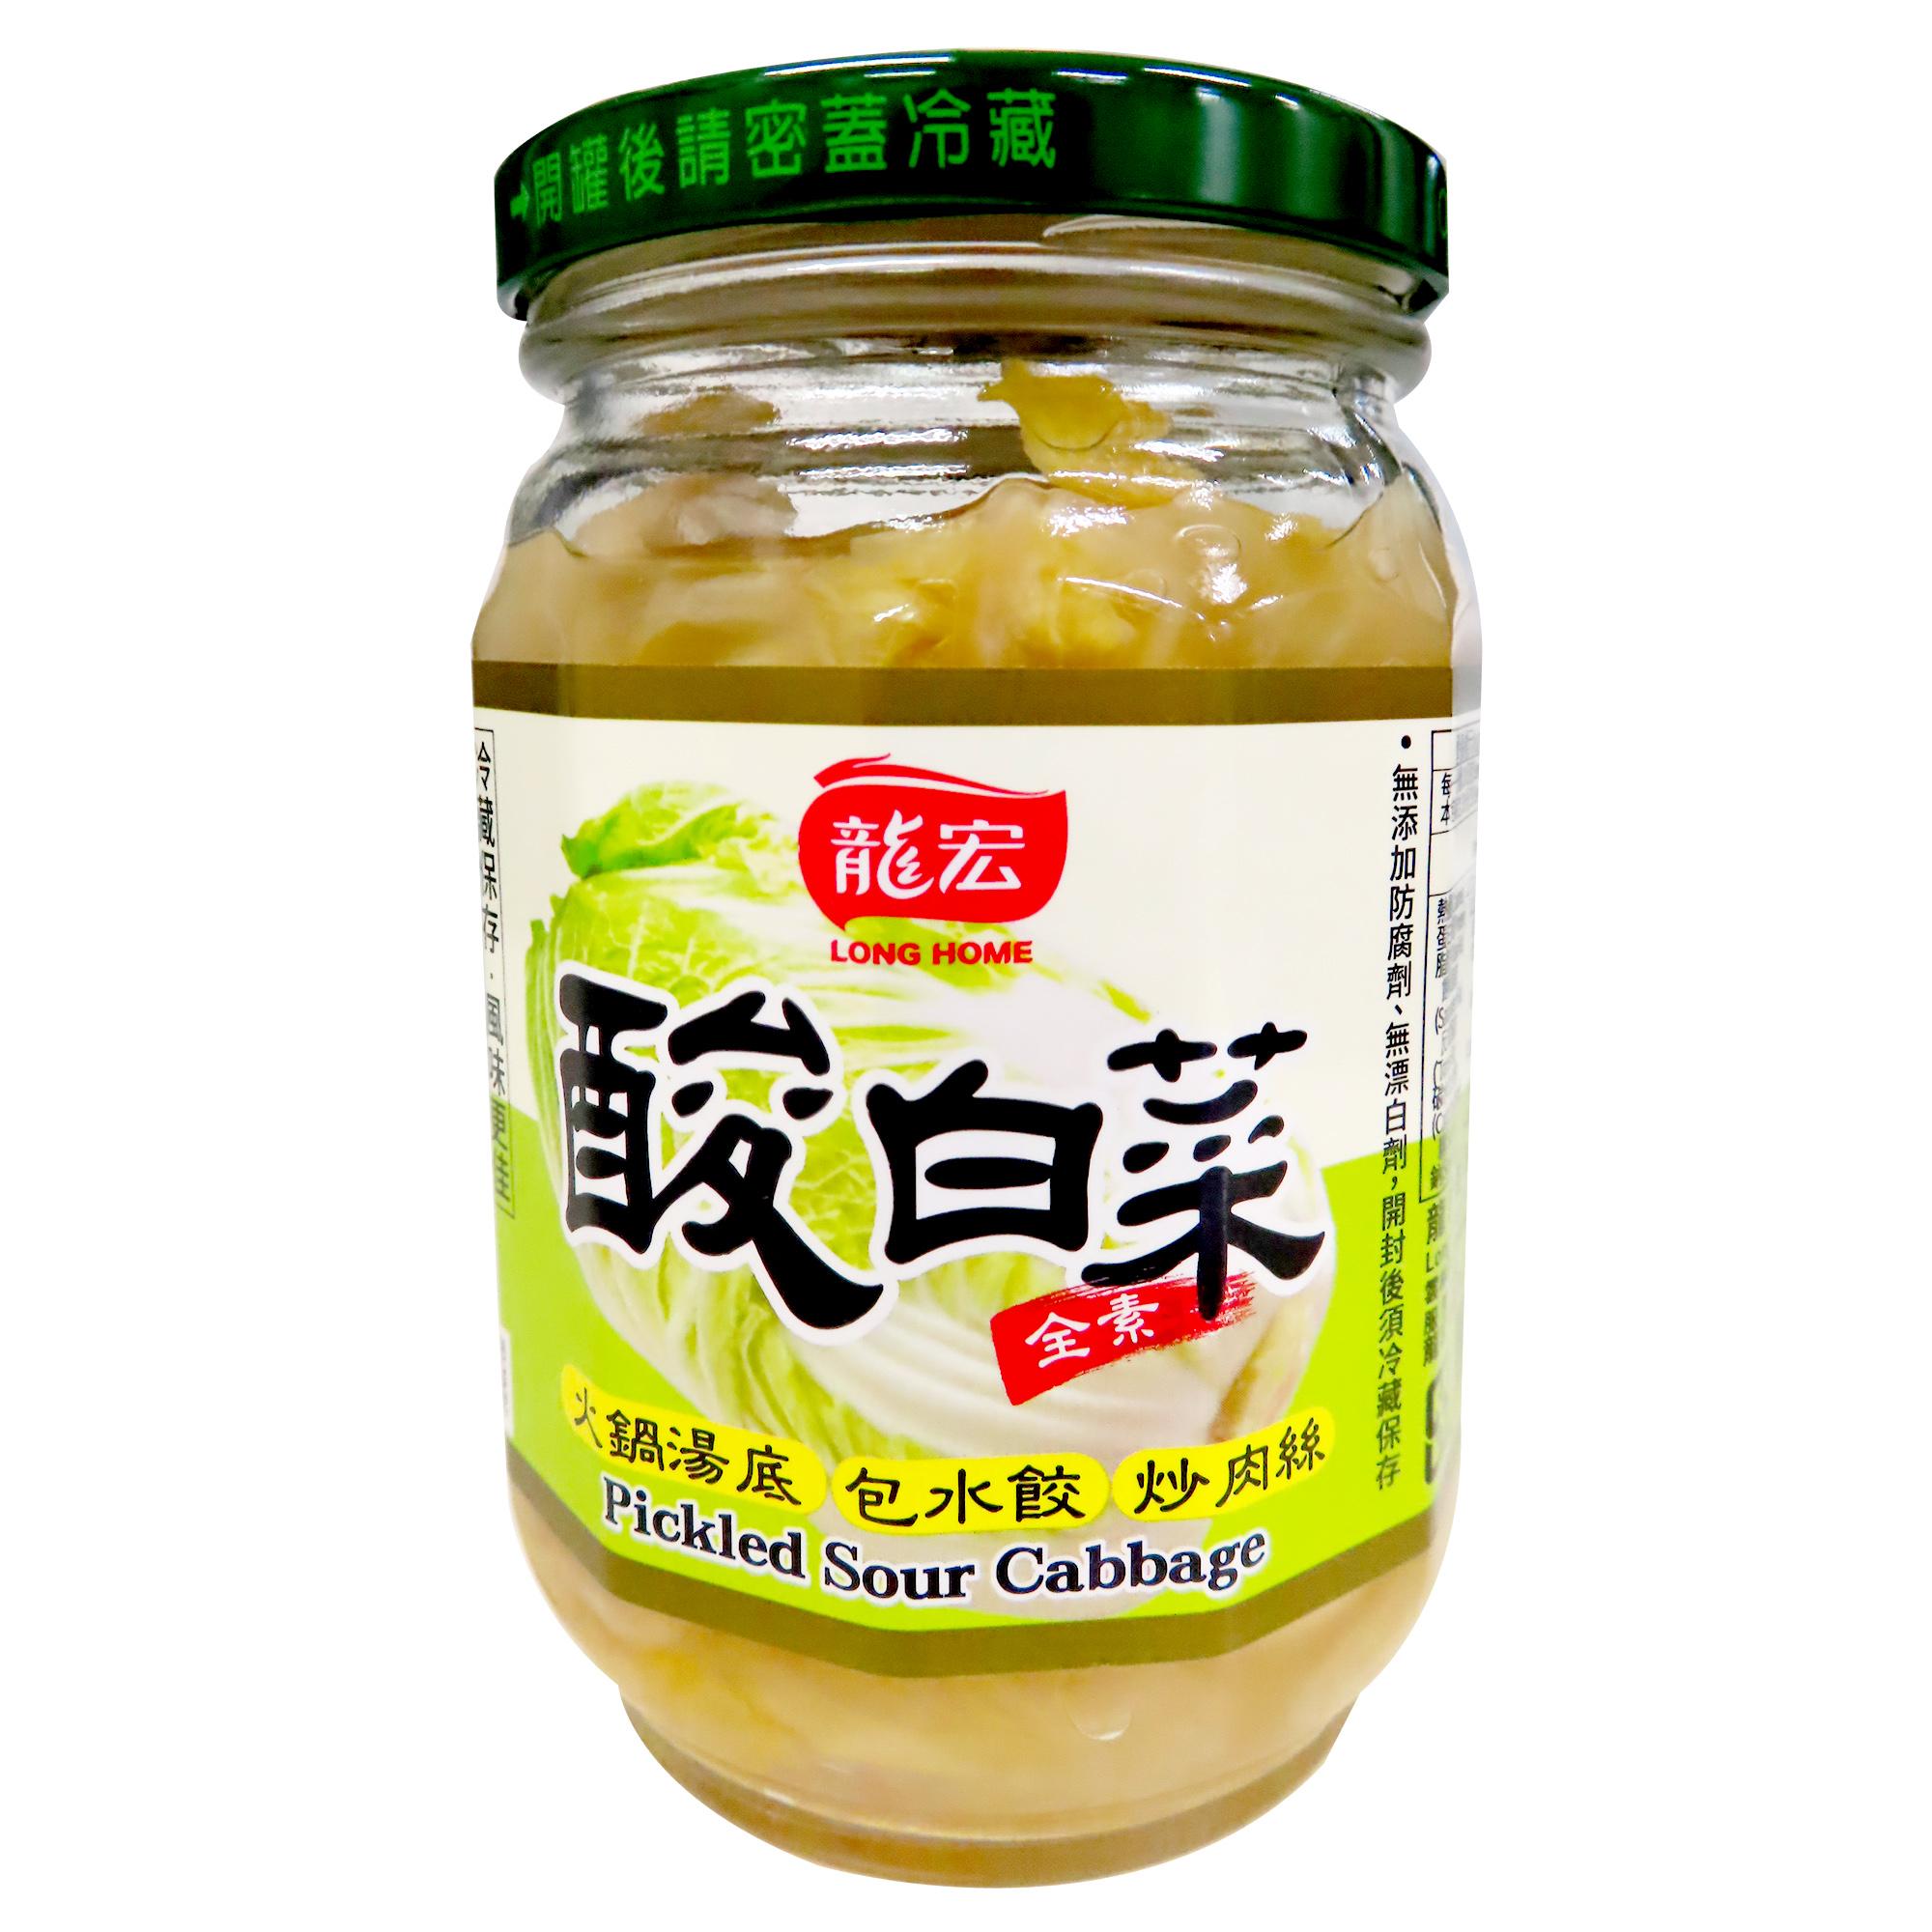 Image Pickled Sour Cabbage 龙宏酸白菜 560grams